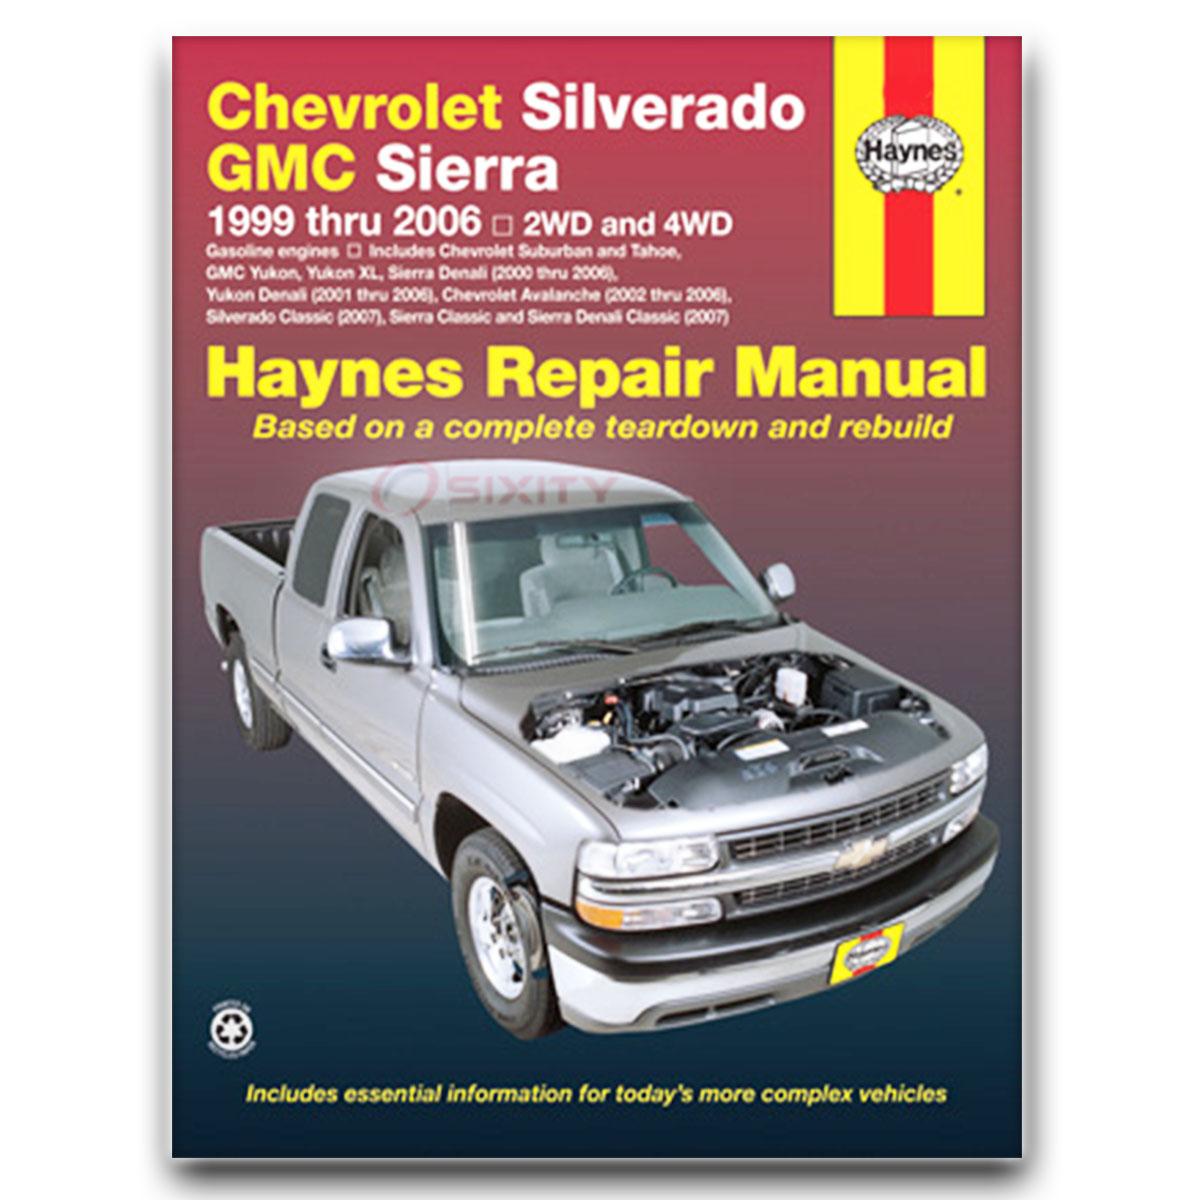 Haynes Repair Manual for Chevy Silverado 3500 Classic LT LS WT Base Shop nt